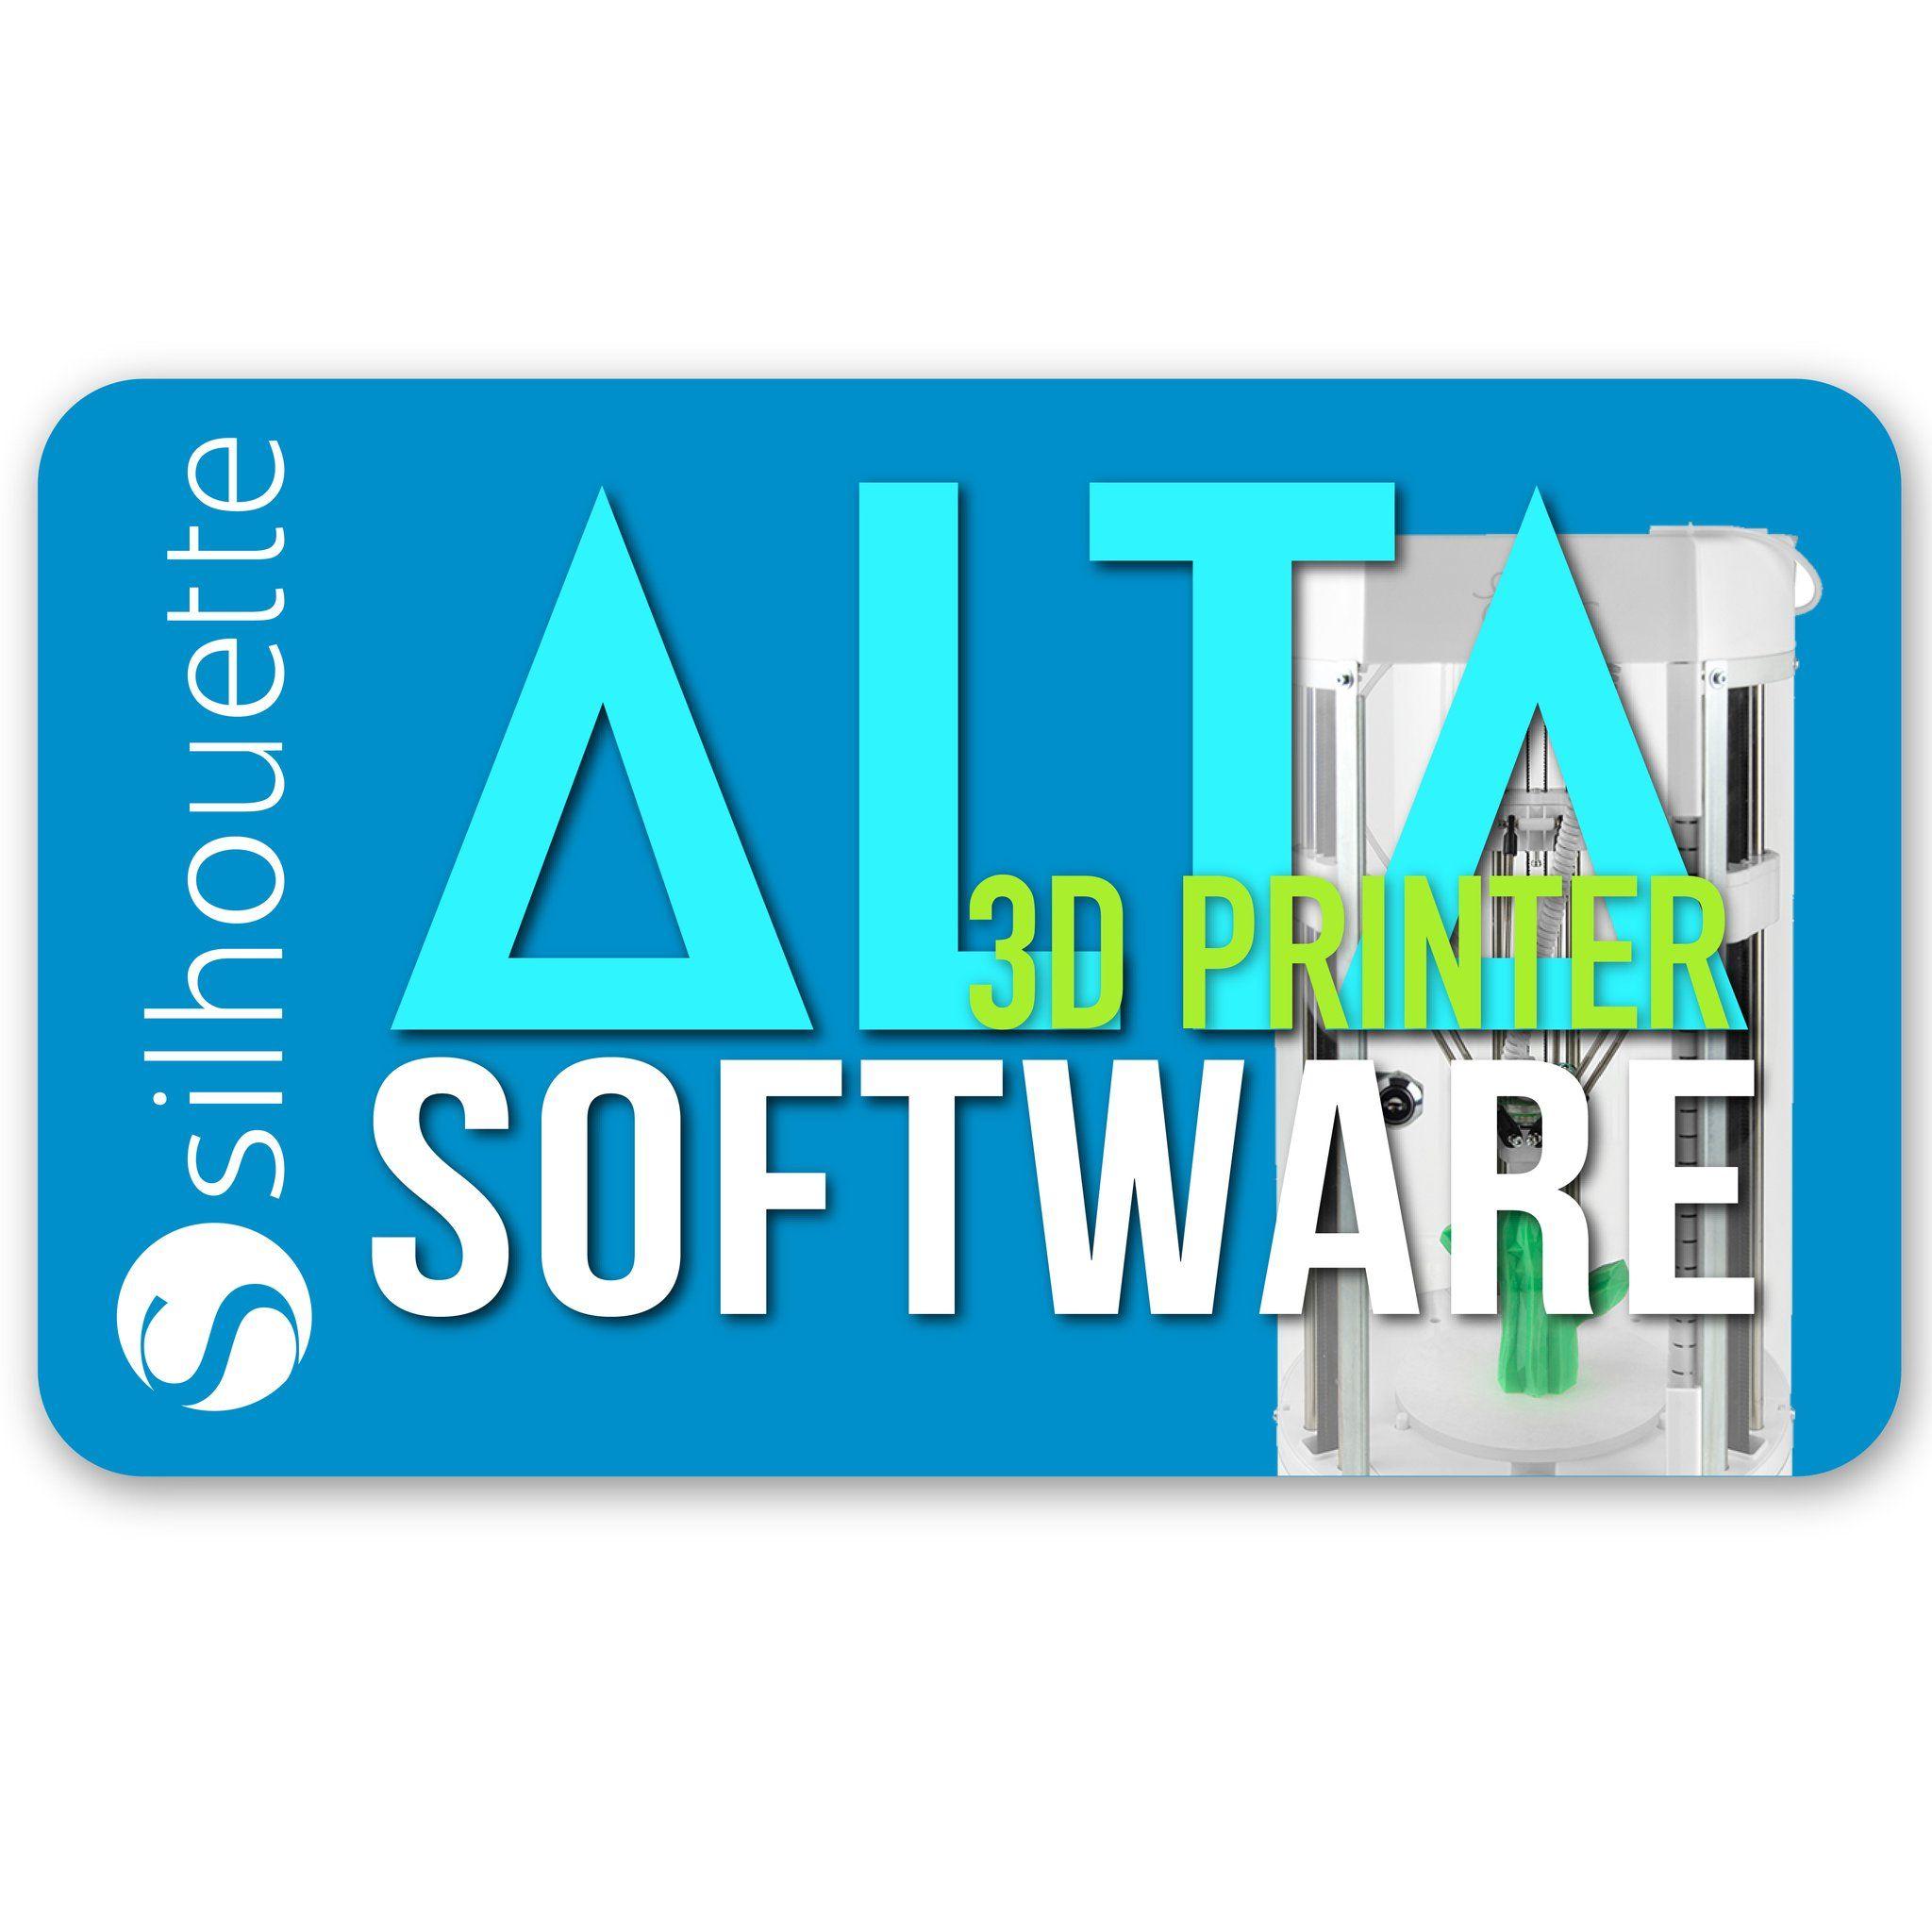 Silhouette Alta 3D Printer Software Latest Version